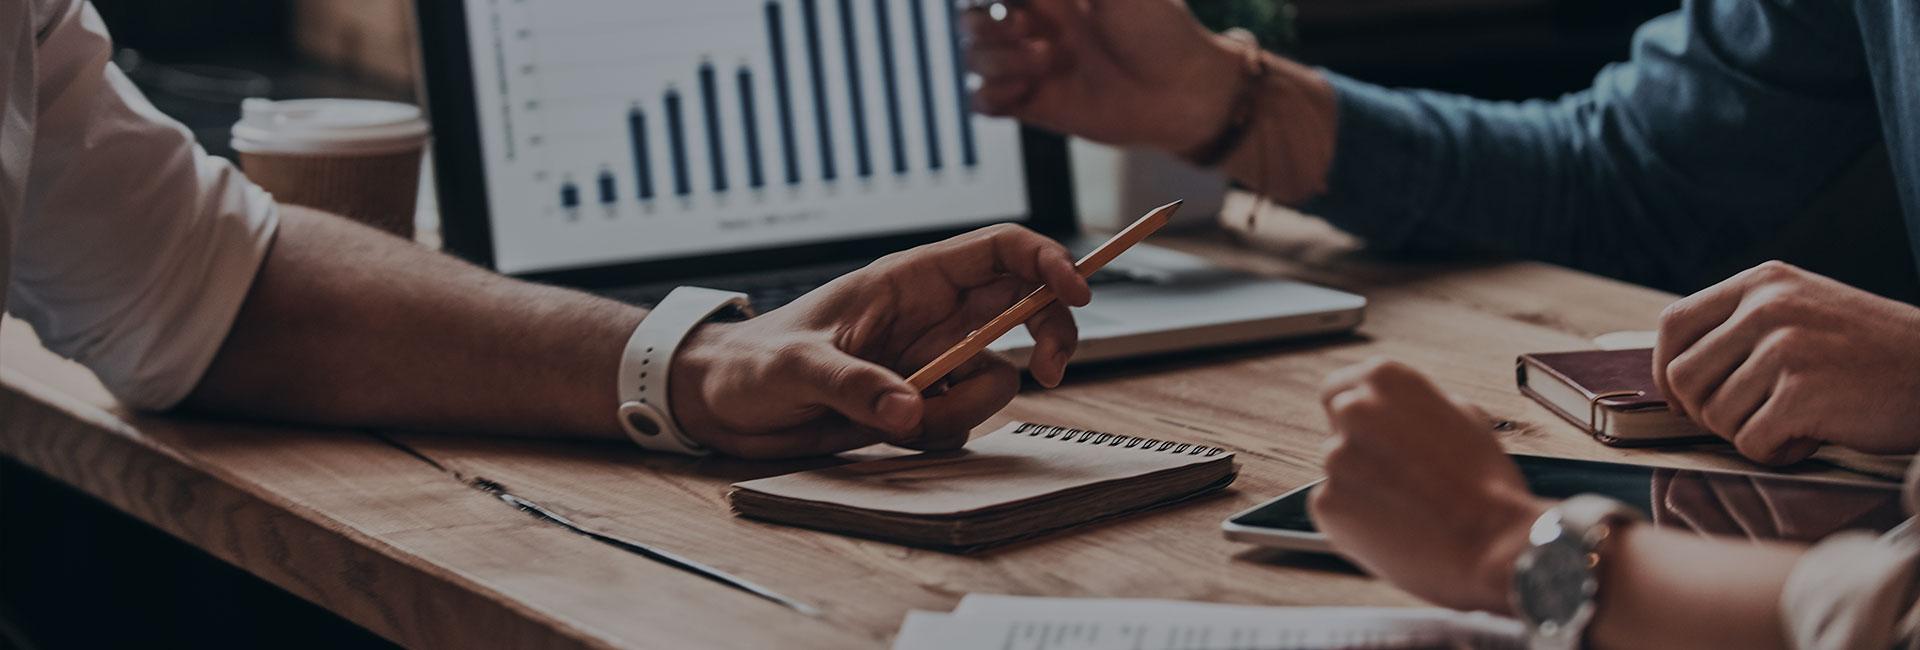 Competitive Market Analysis Navazon Digital Marketing Los Angeles